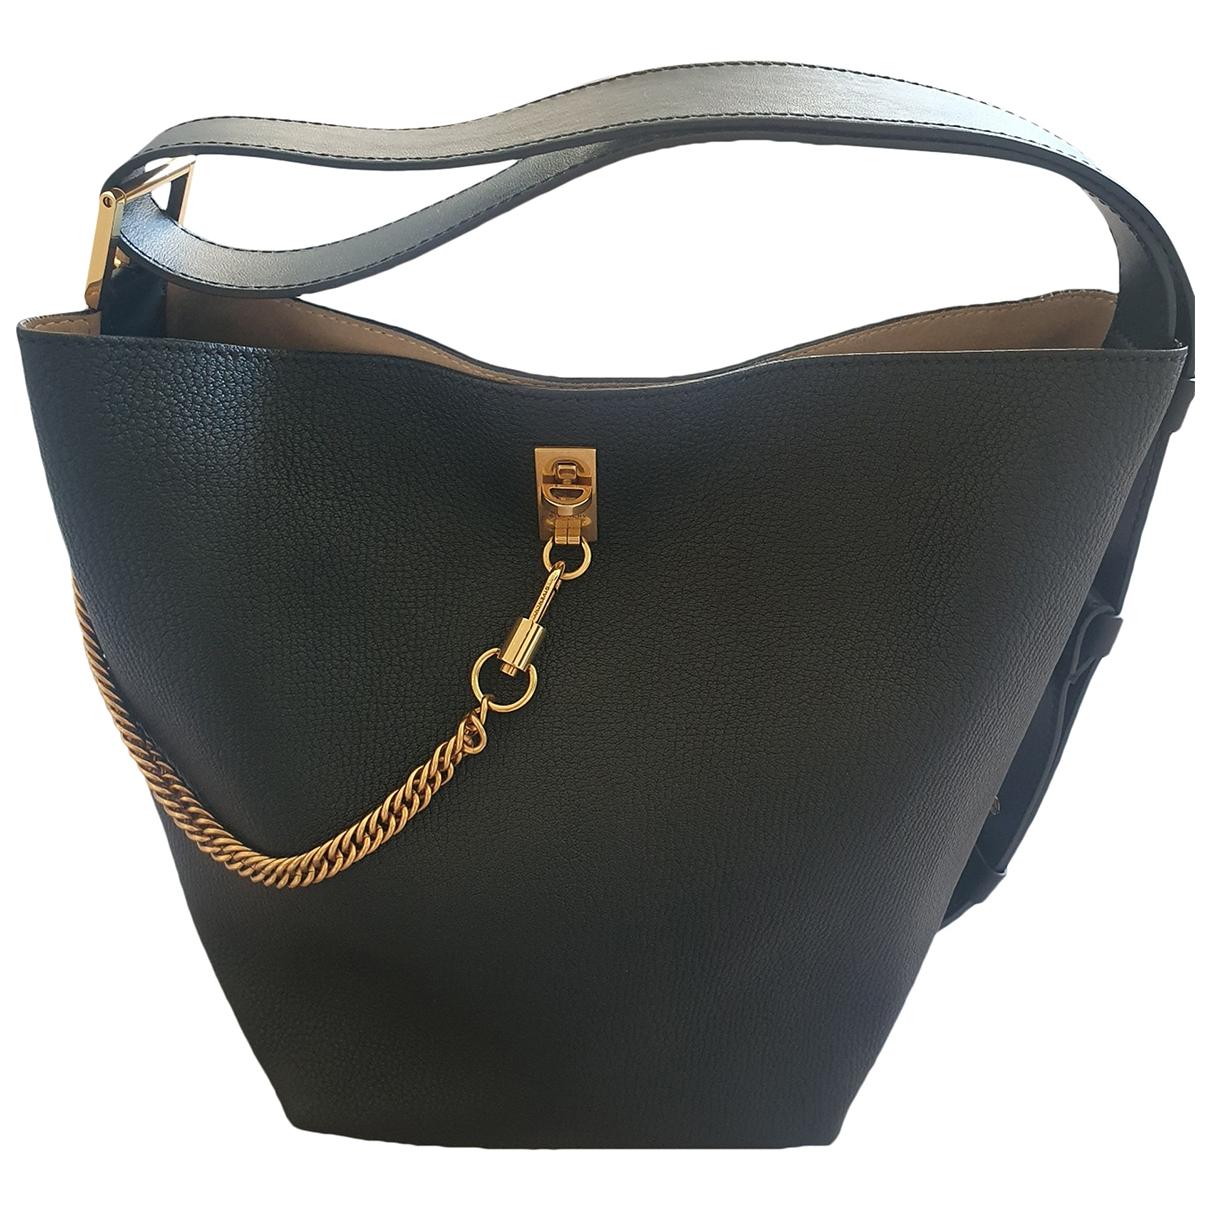 Givenchy - Sac a main Seau GV Bucket pour femme en cuir - noir